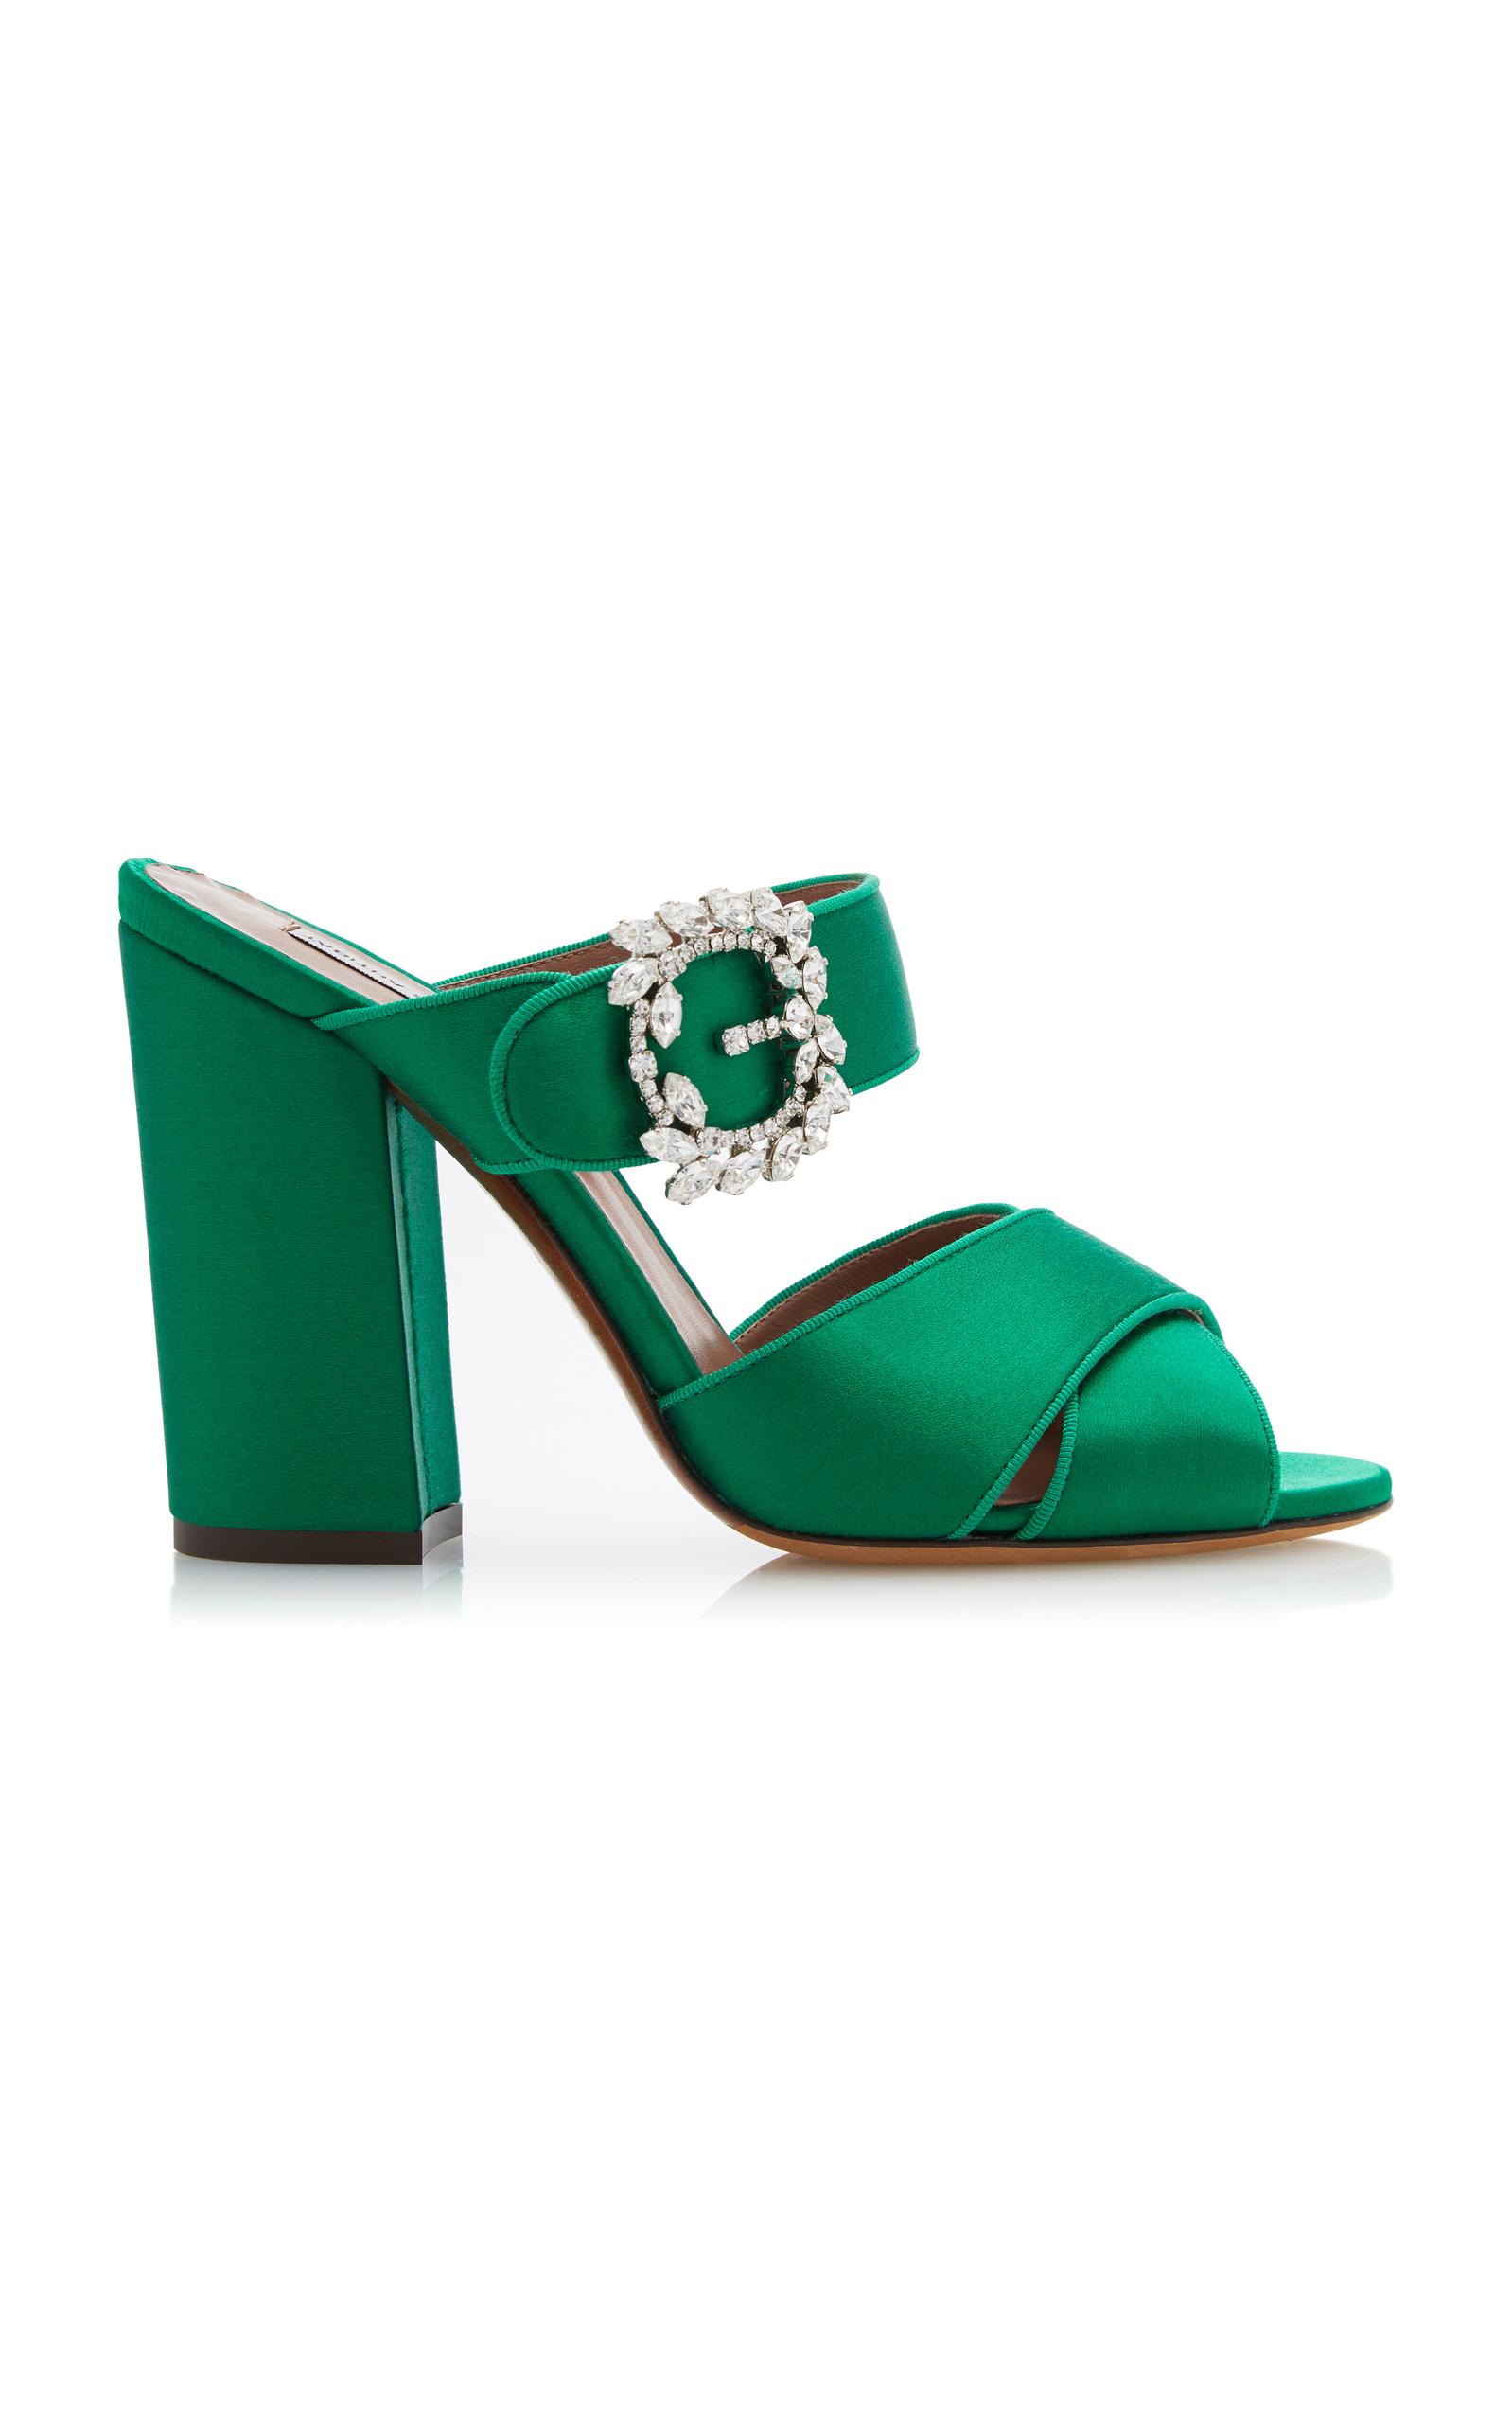 Tabitha Simmons Reyner Embellished Satin Block-Heel Sandals 8R0d2